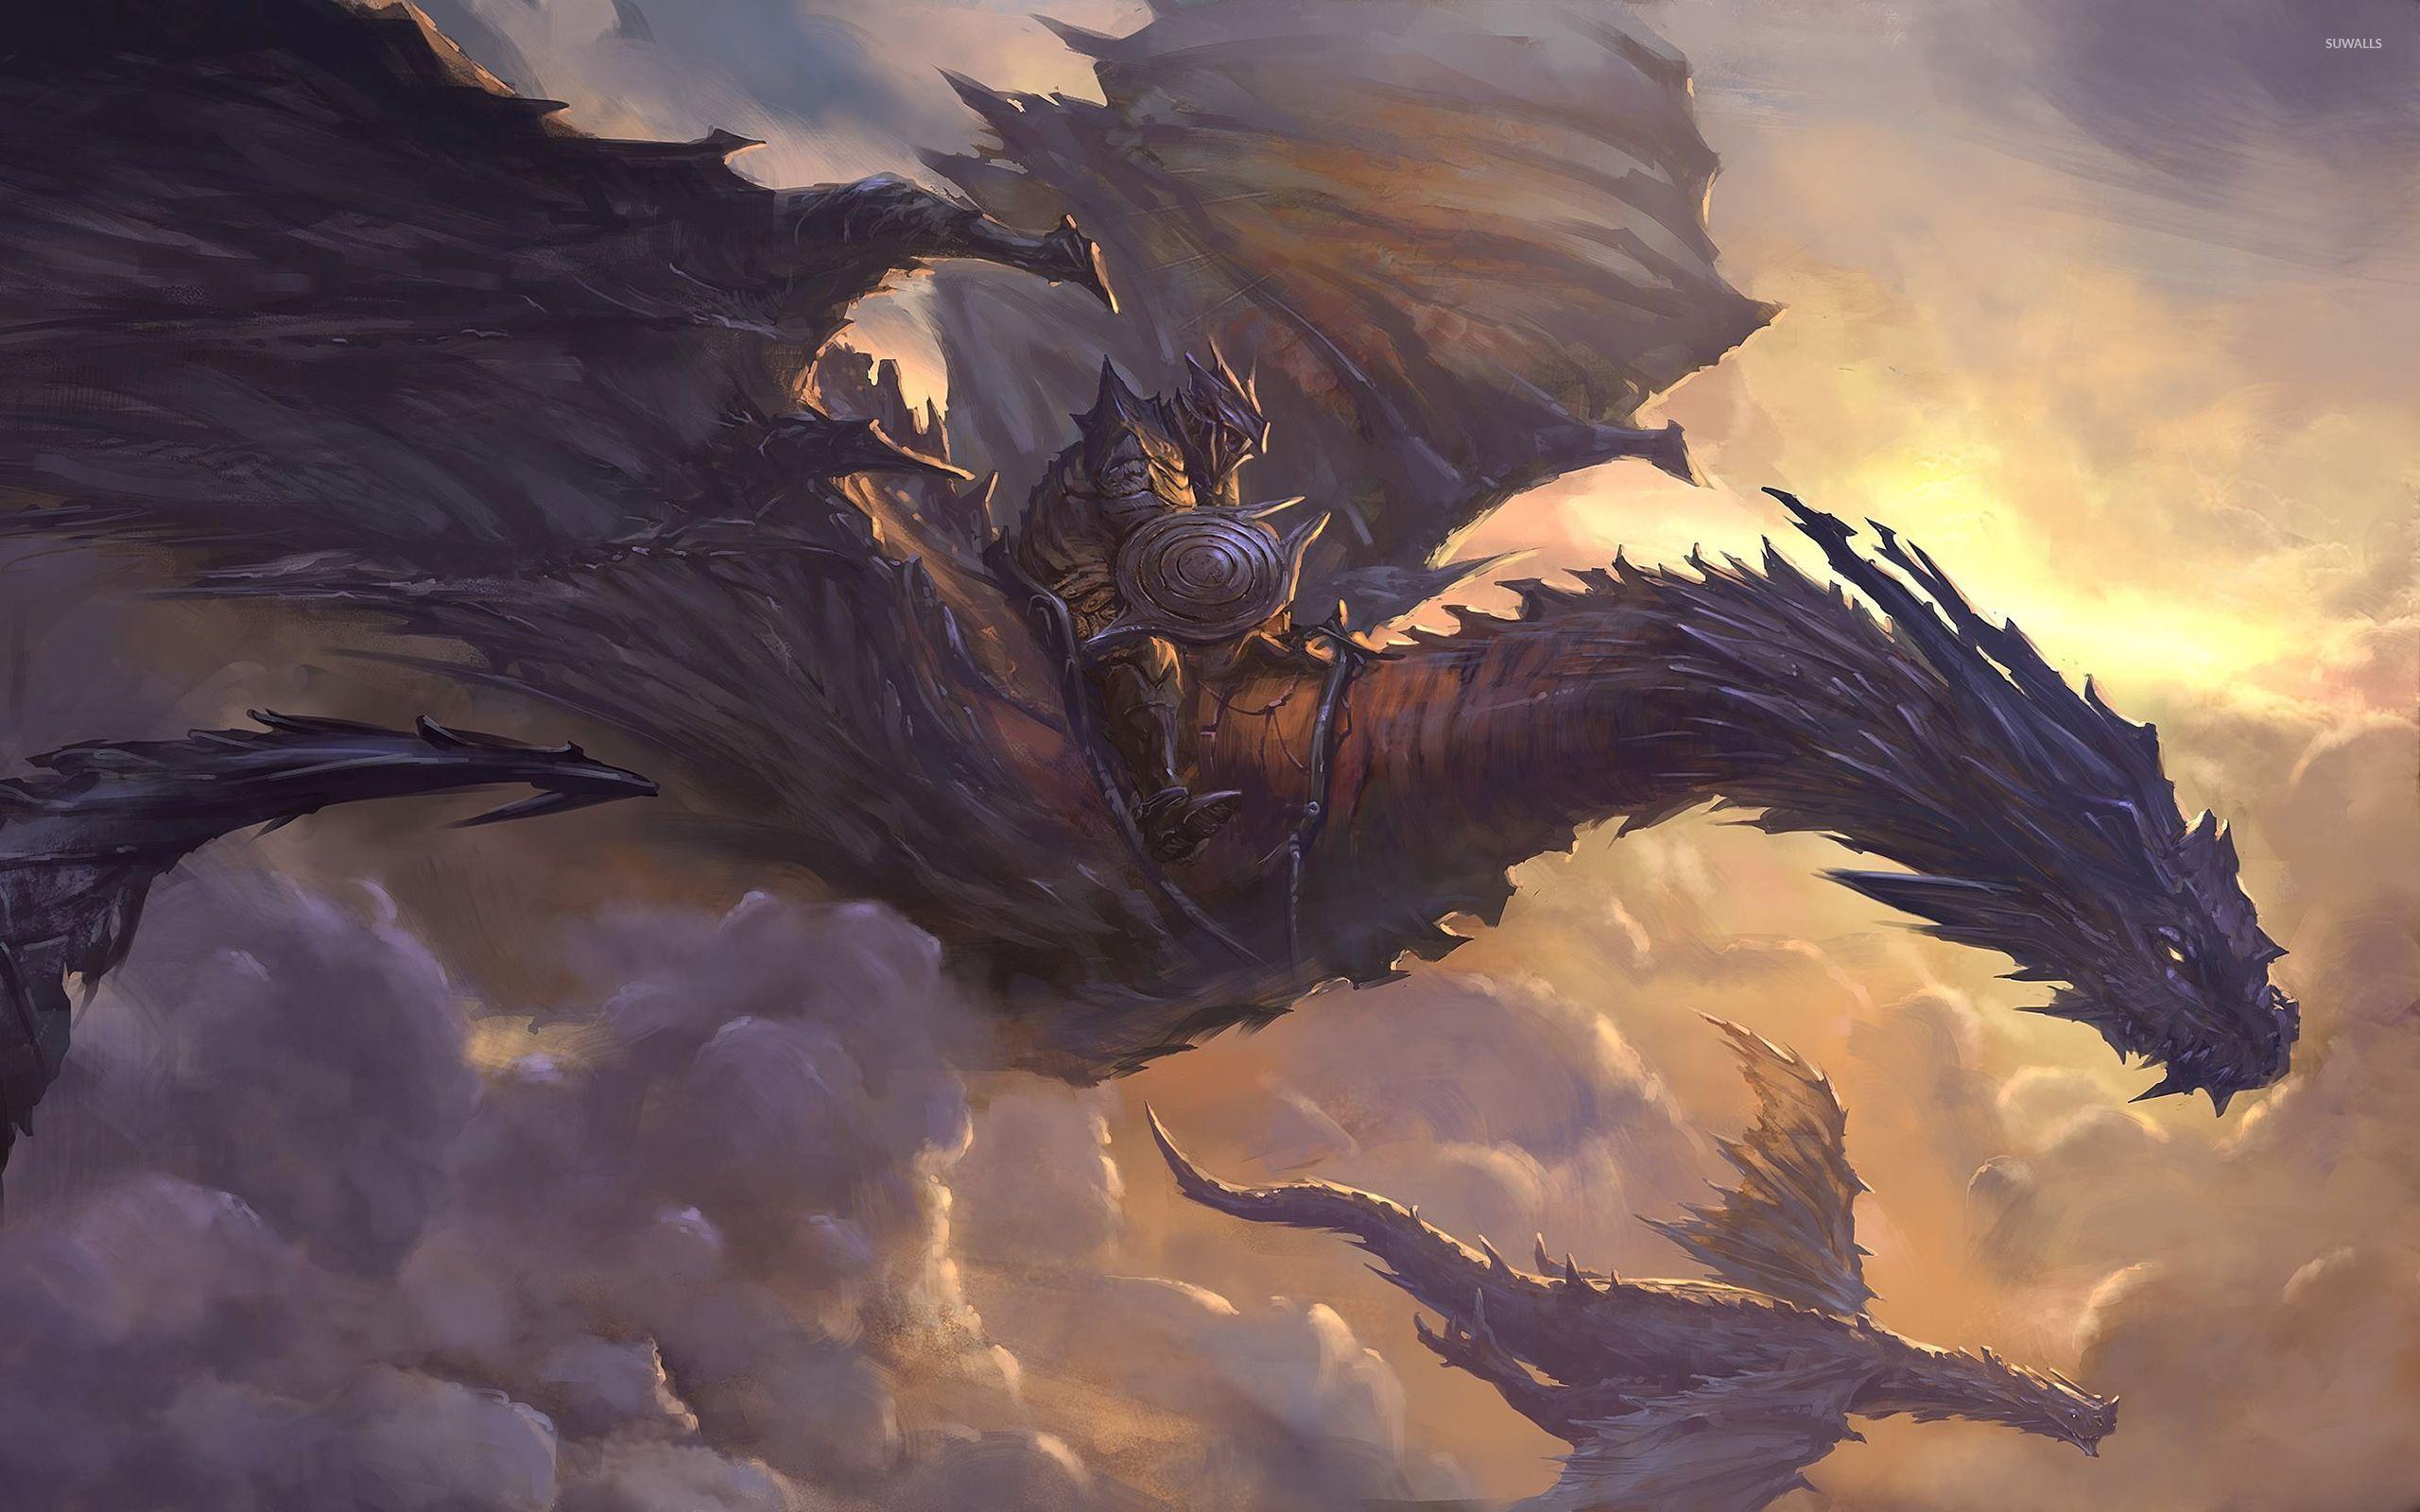 Simple Wallpaper Night Dragon - knight-on-dragon-32695-2560x1600  HD.jpg